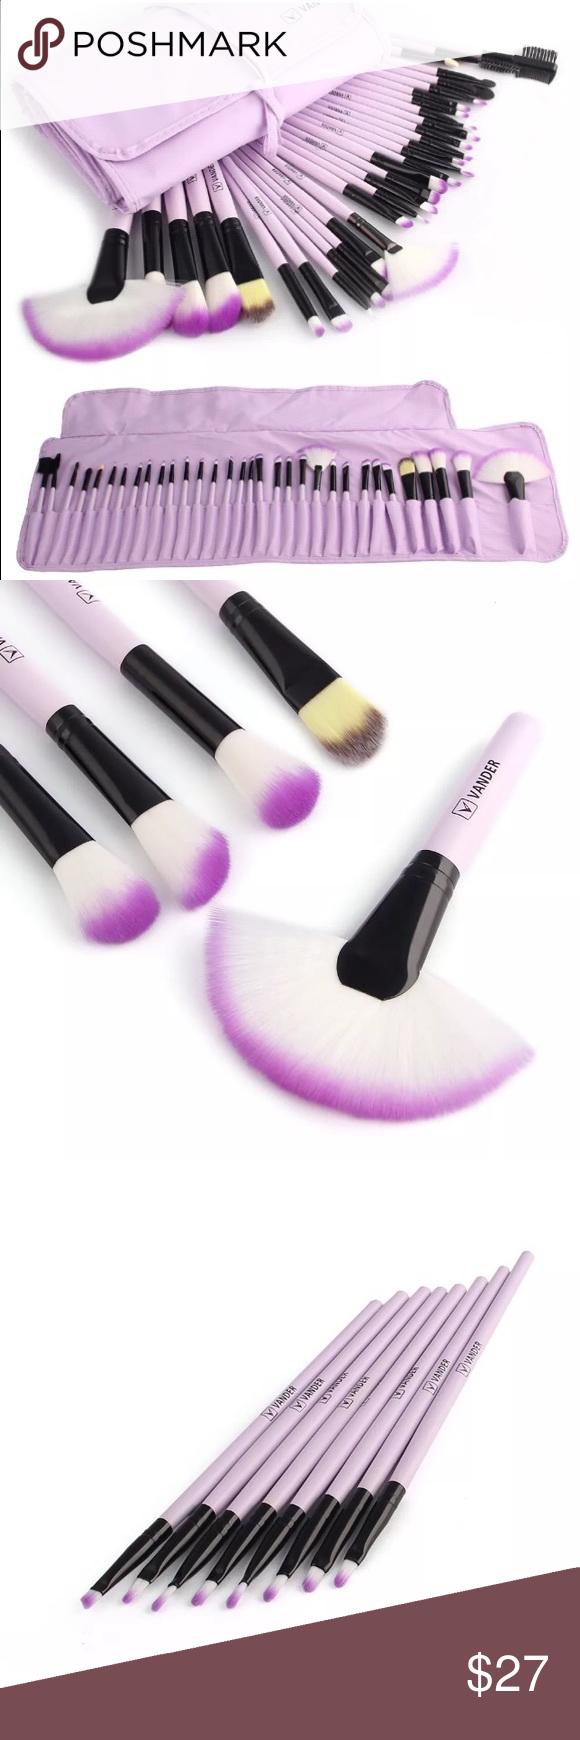 Vander Profesional 32pcs Makeup Brush NWT Boutique Lip